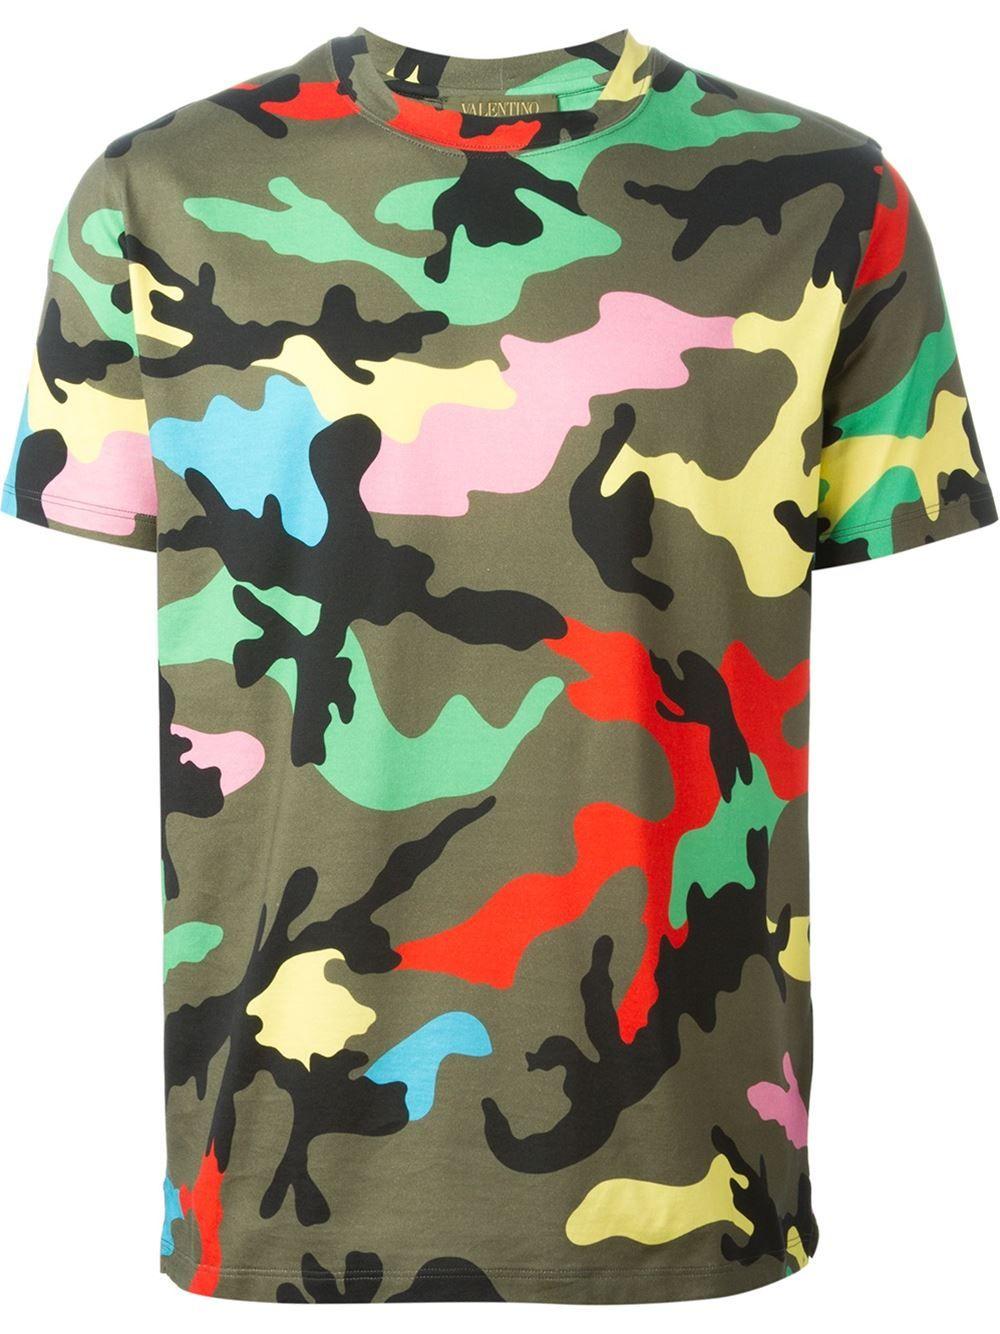 872fe6ca Men's Designer T-Shirts 2019. Valentino 'rockstud' Camouflage T-shirt -  Julian Fashion - Farfetch.com